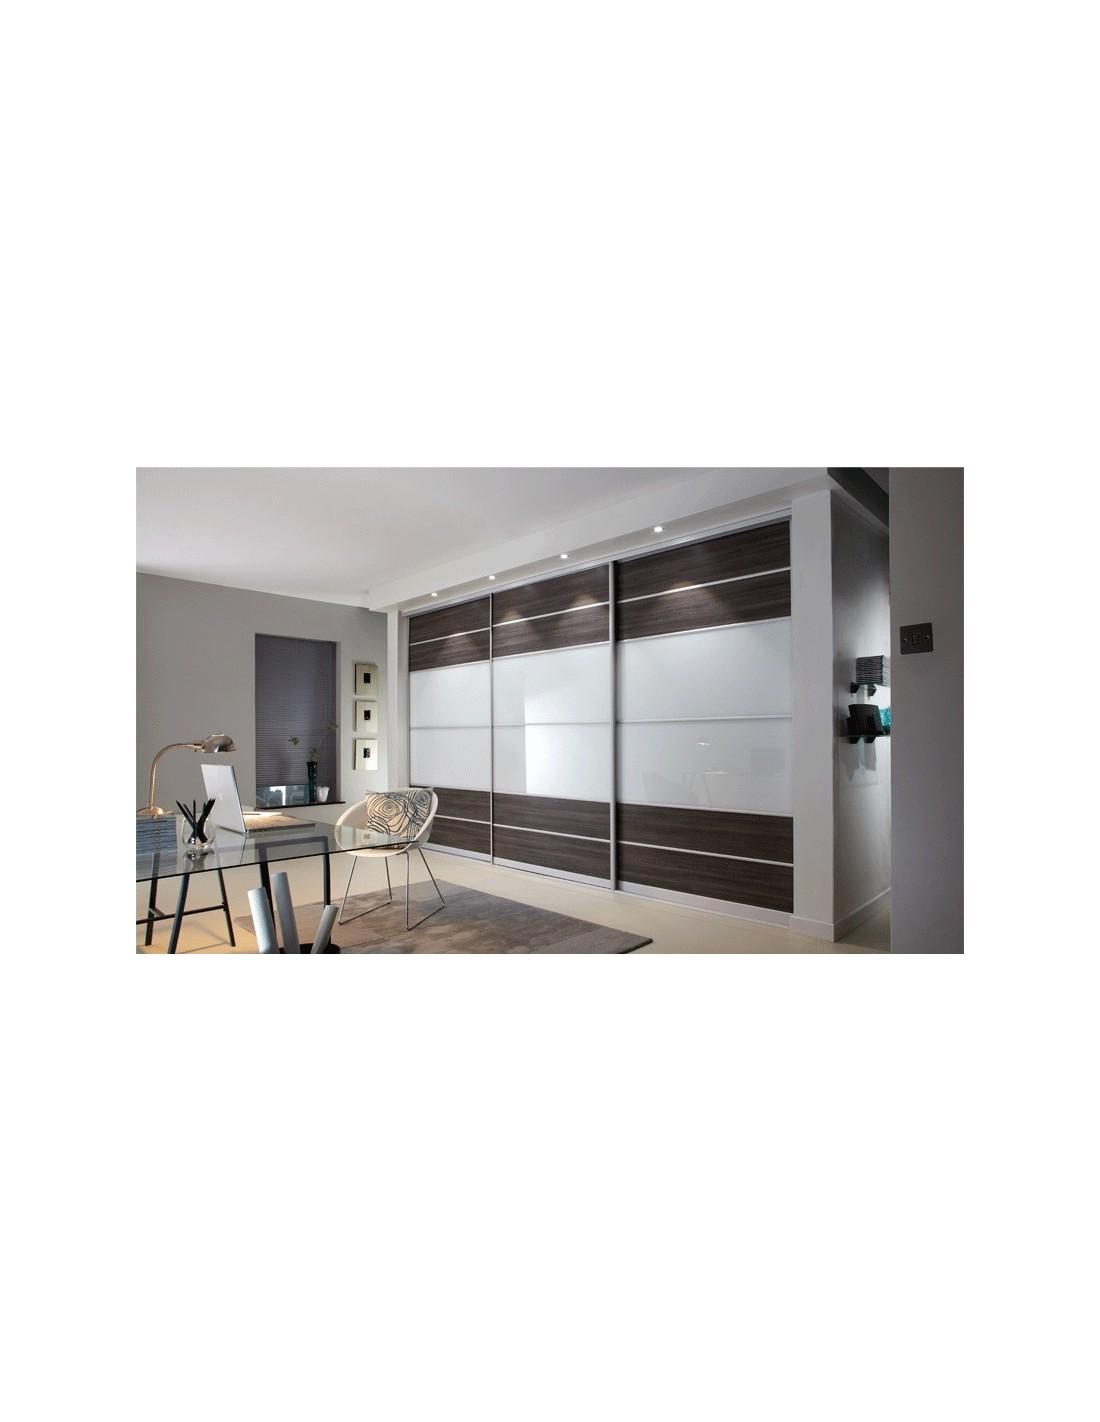 Sliding Bedroom Doors White Avola & Stone Grey Made to Measure ...